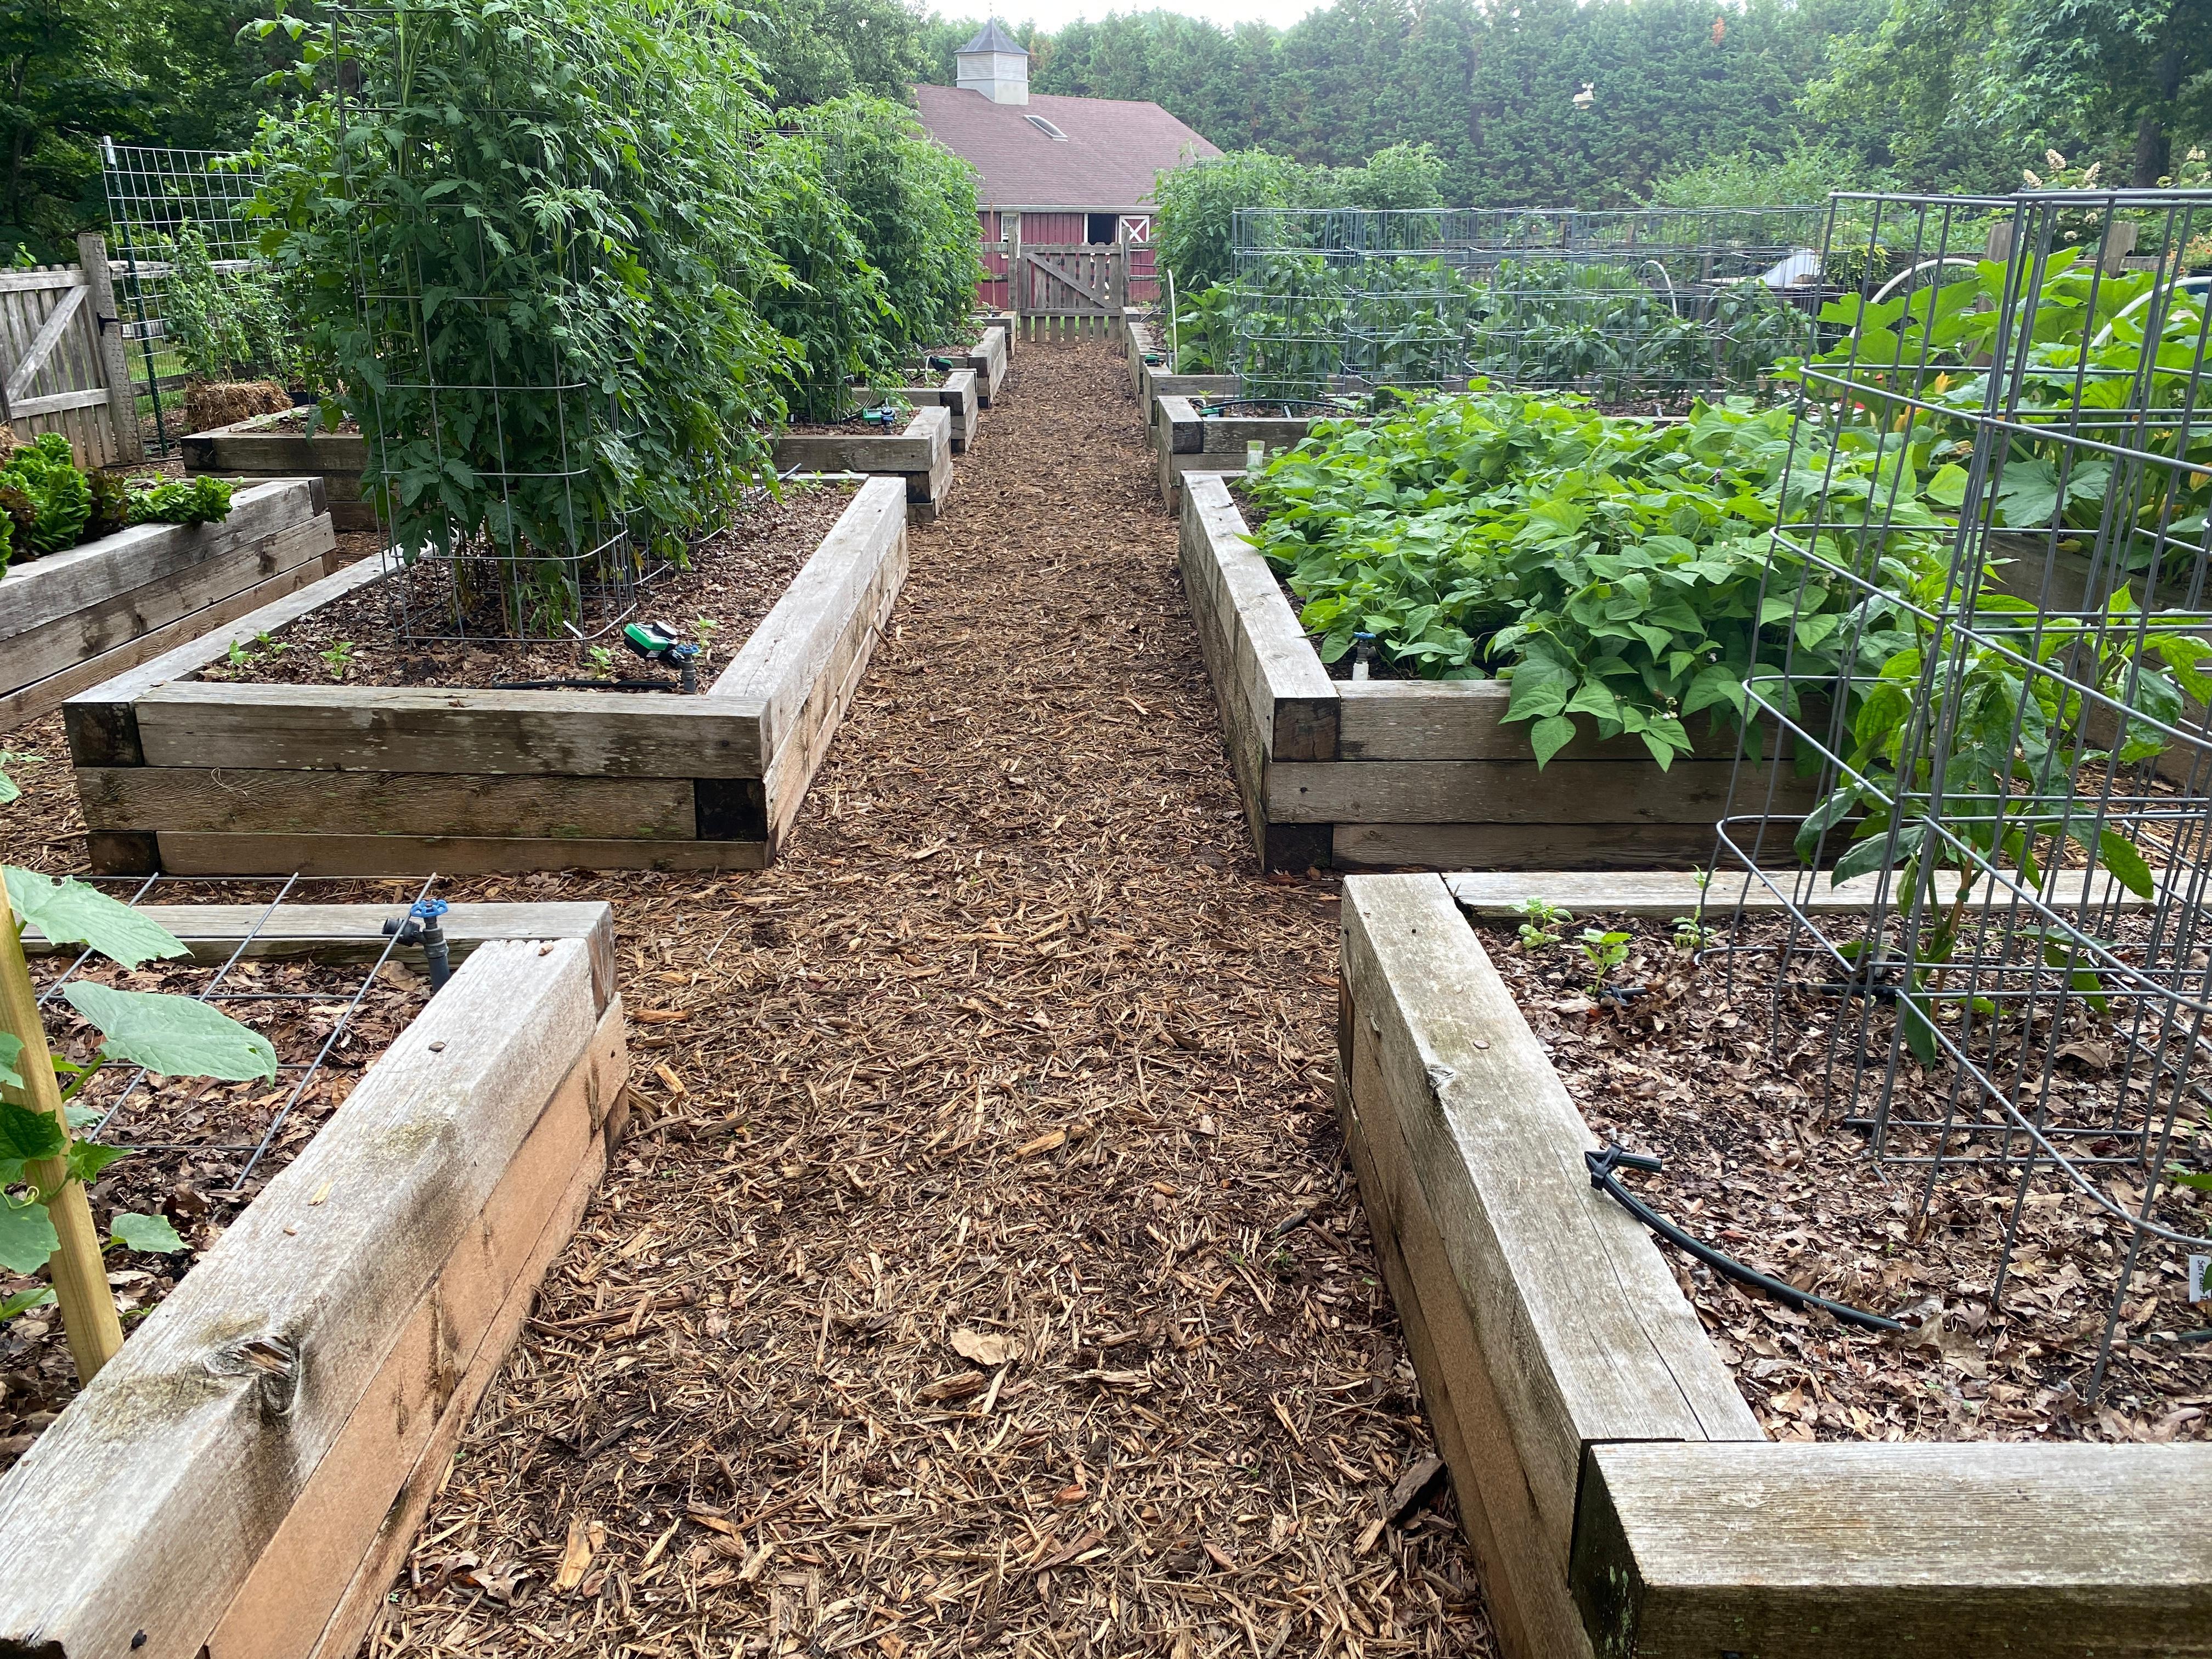 Crop Rotation in Joe Lampls garden farm1